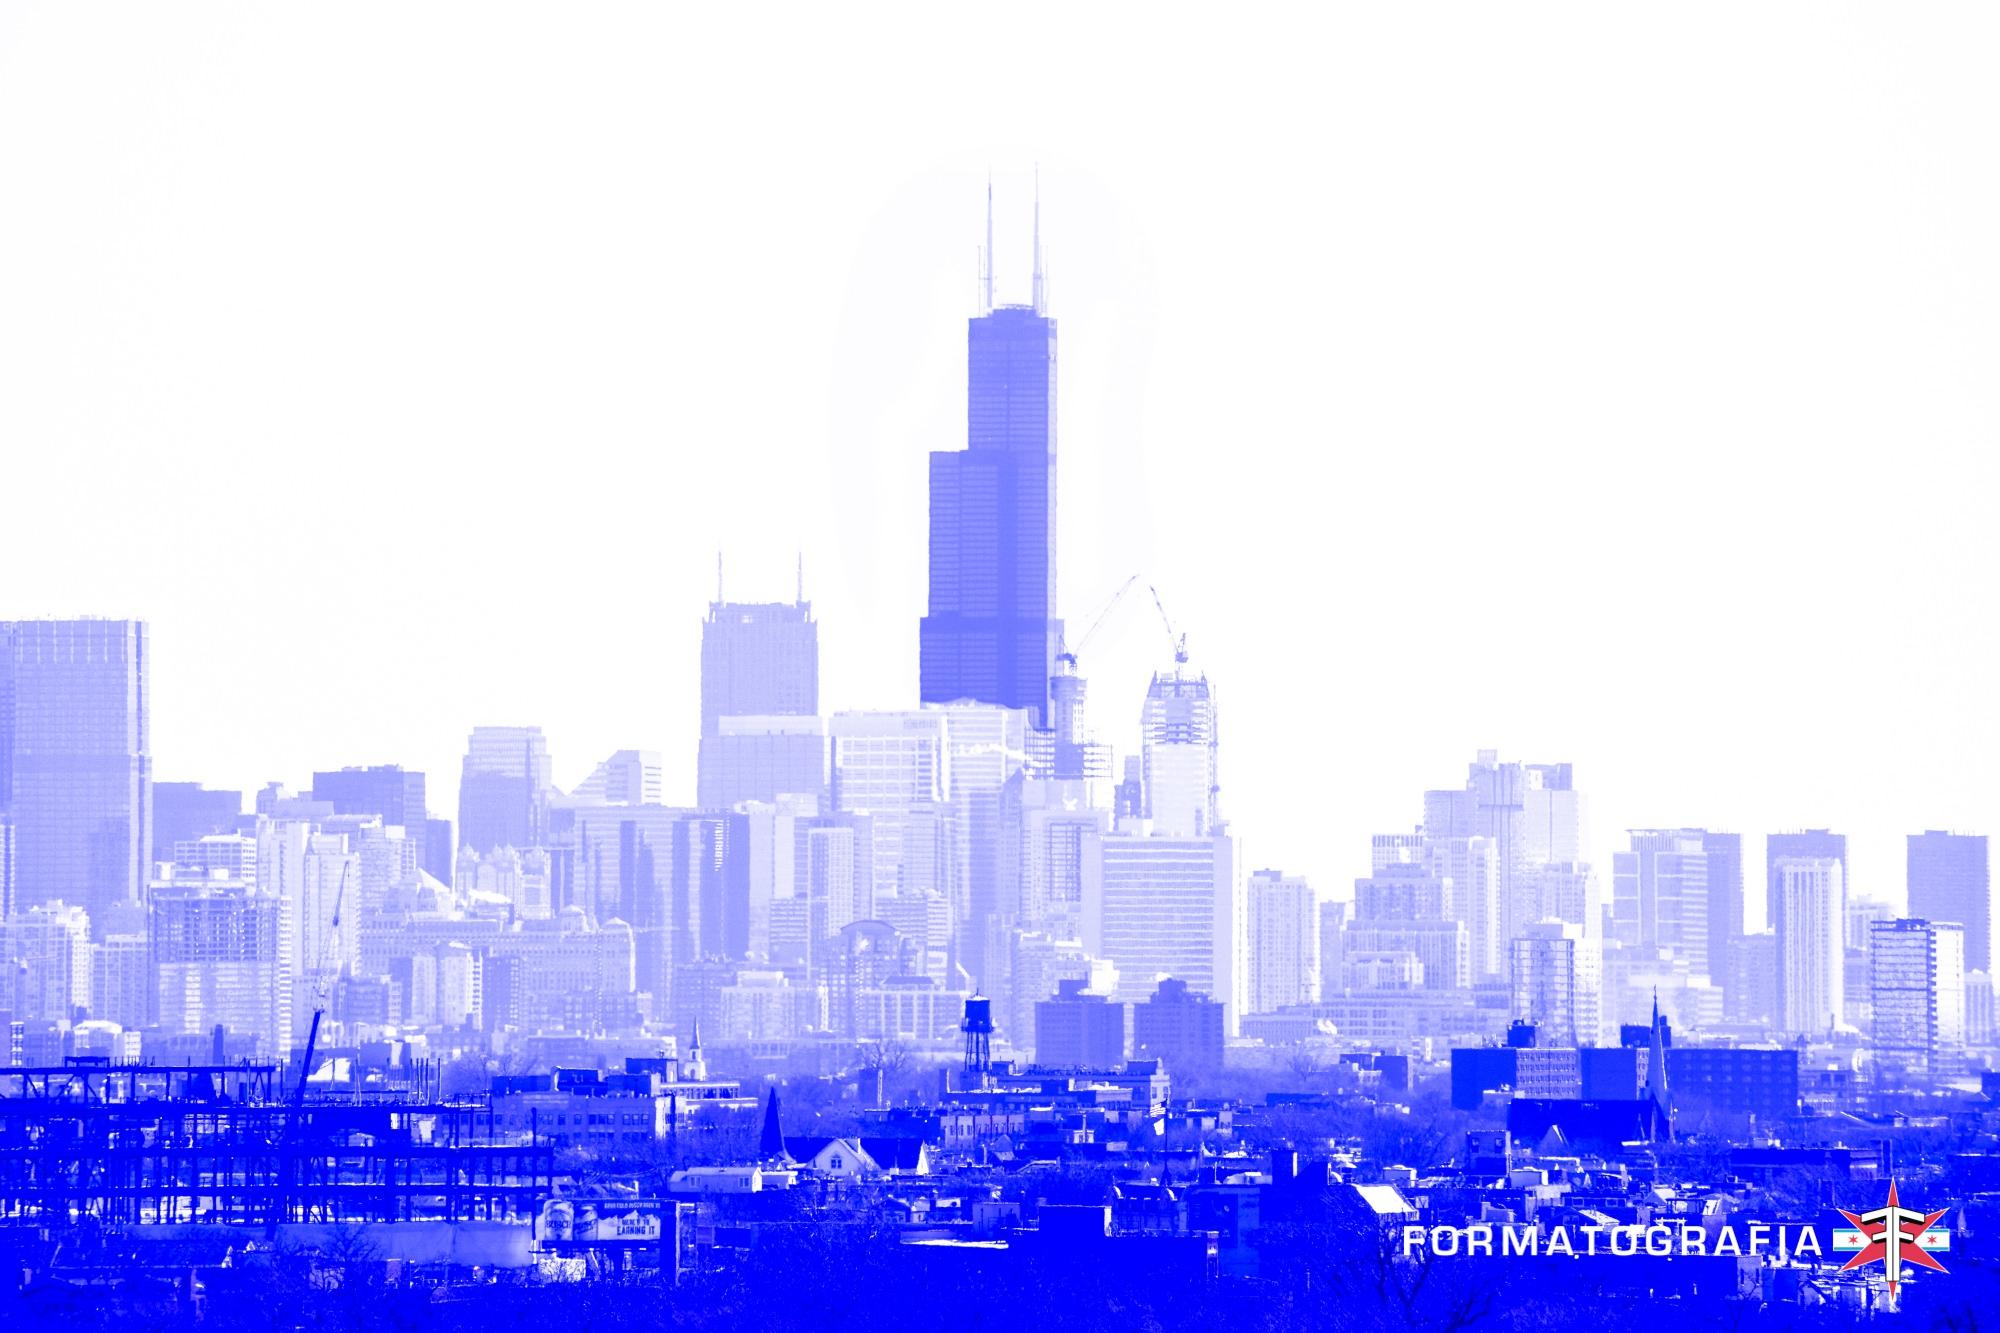 eric formato chicago photographer fall update city architecture shots20160302-DSC_0637-2.jpg